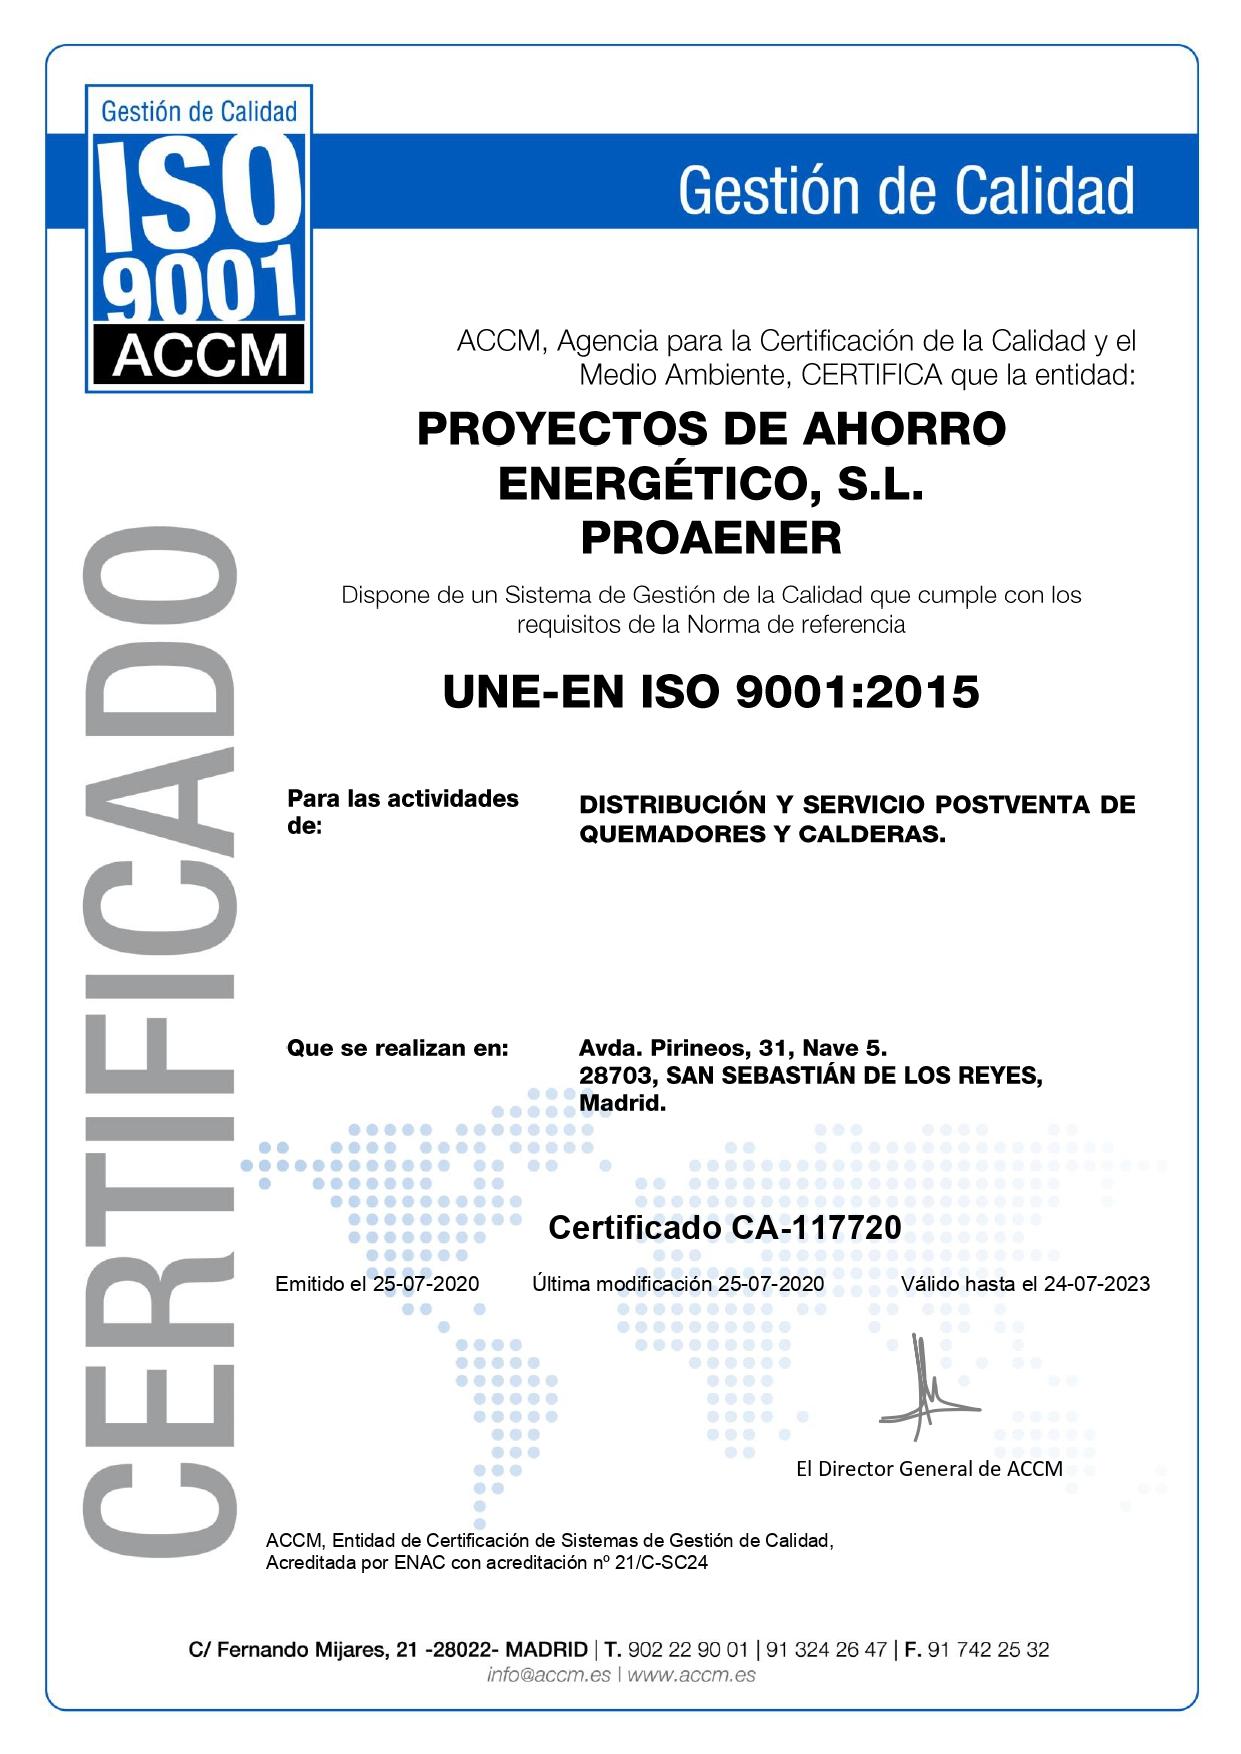 Proaener ISO 9001 - CA-117720